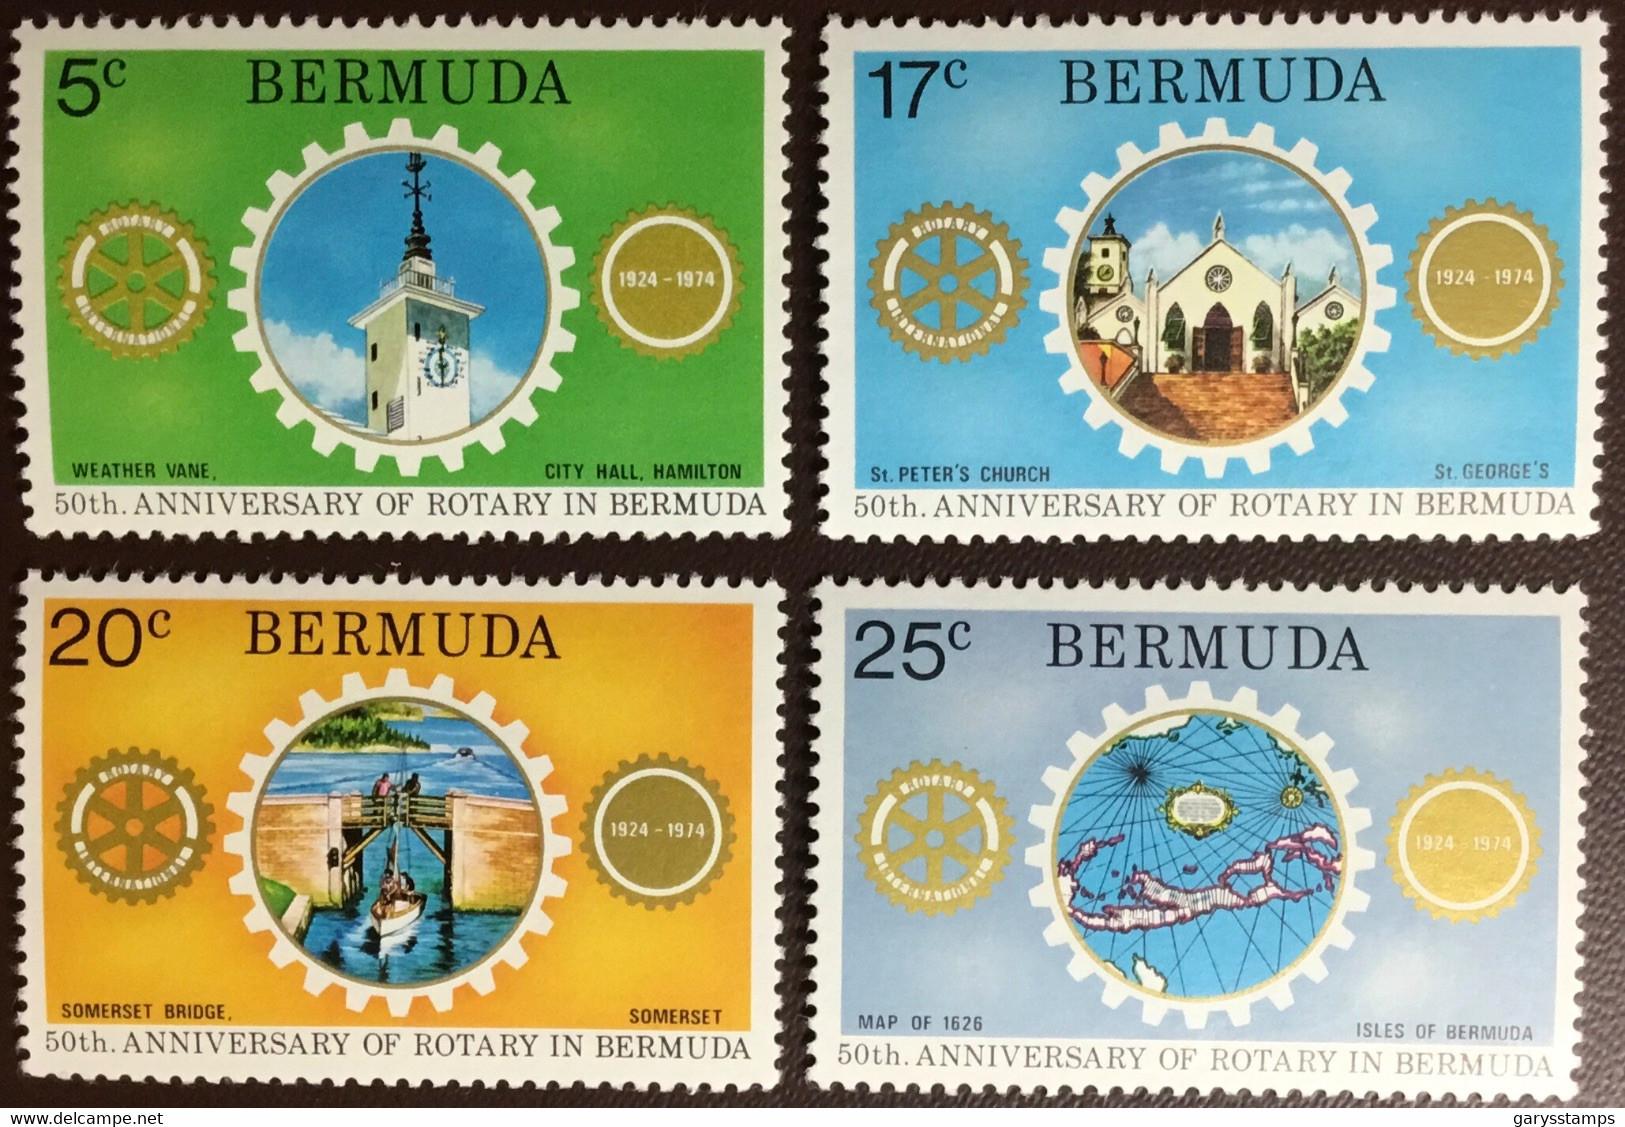 Bermuda 1974 Rotary MNH - Bermuda